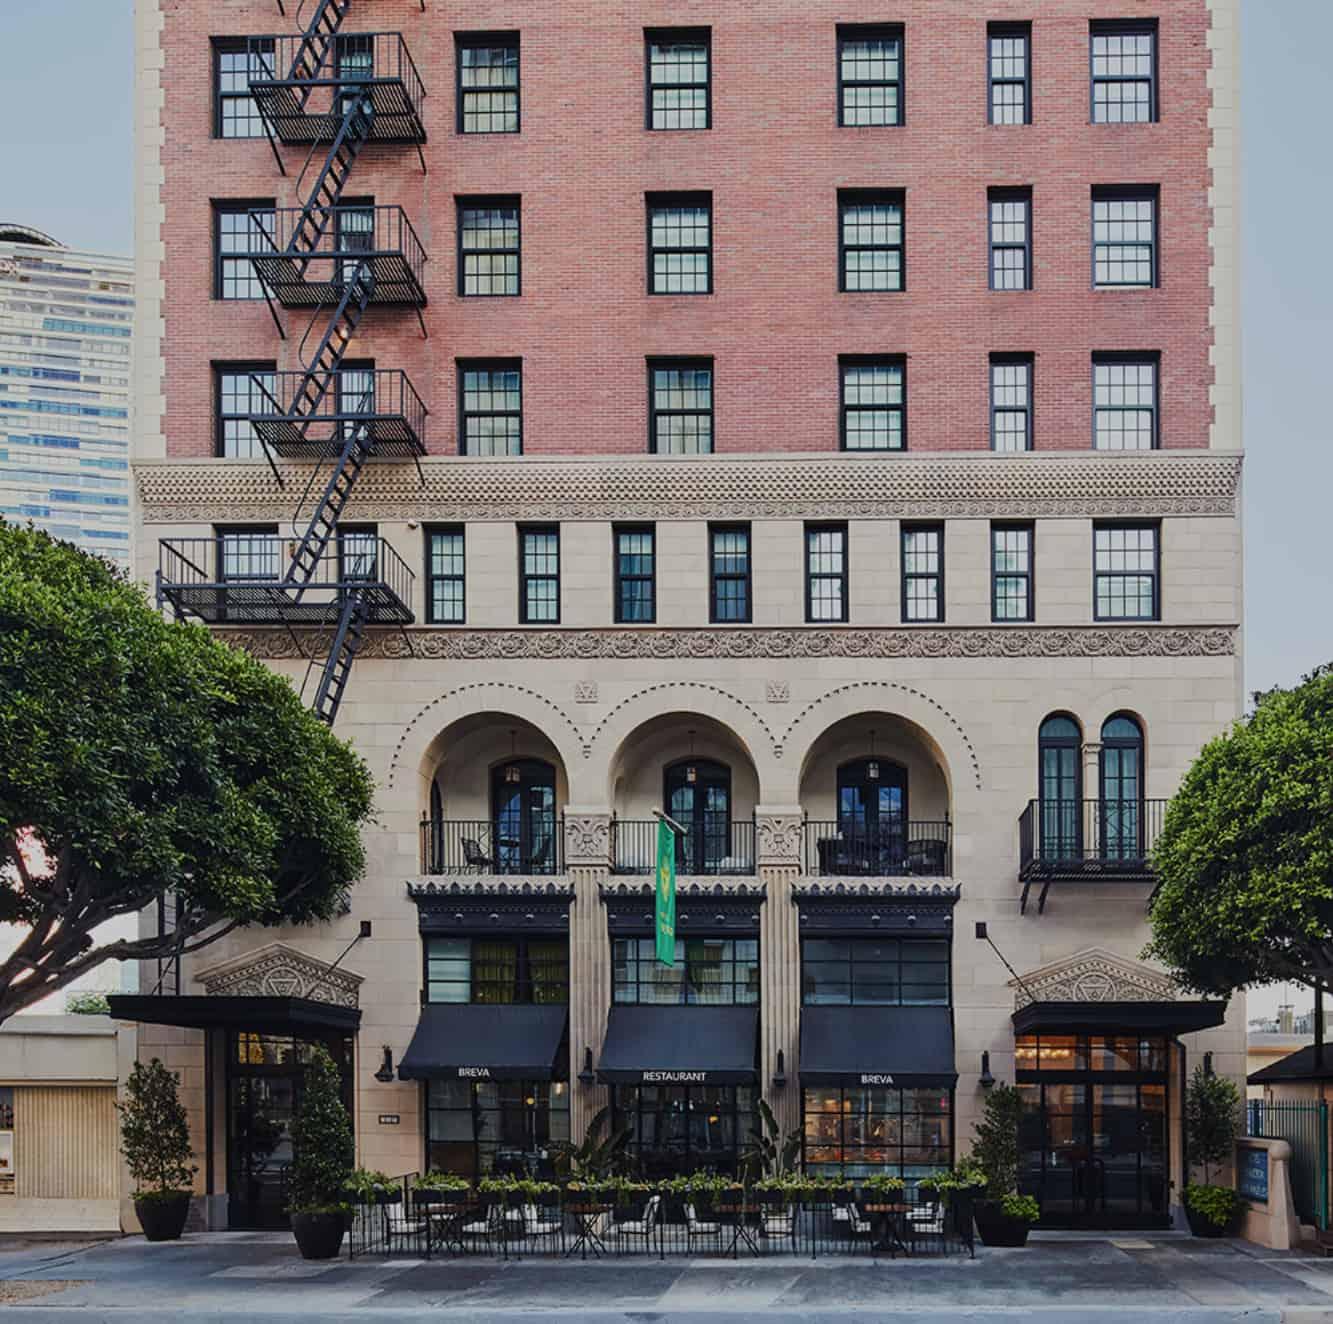 Breva Restaurant In Downtown Los Angeles Hotel Figueroa